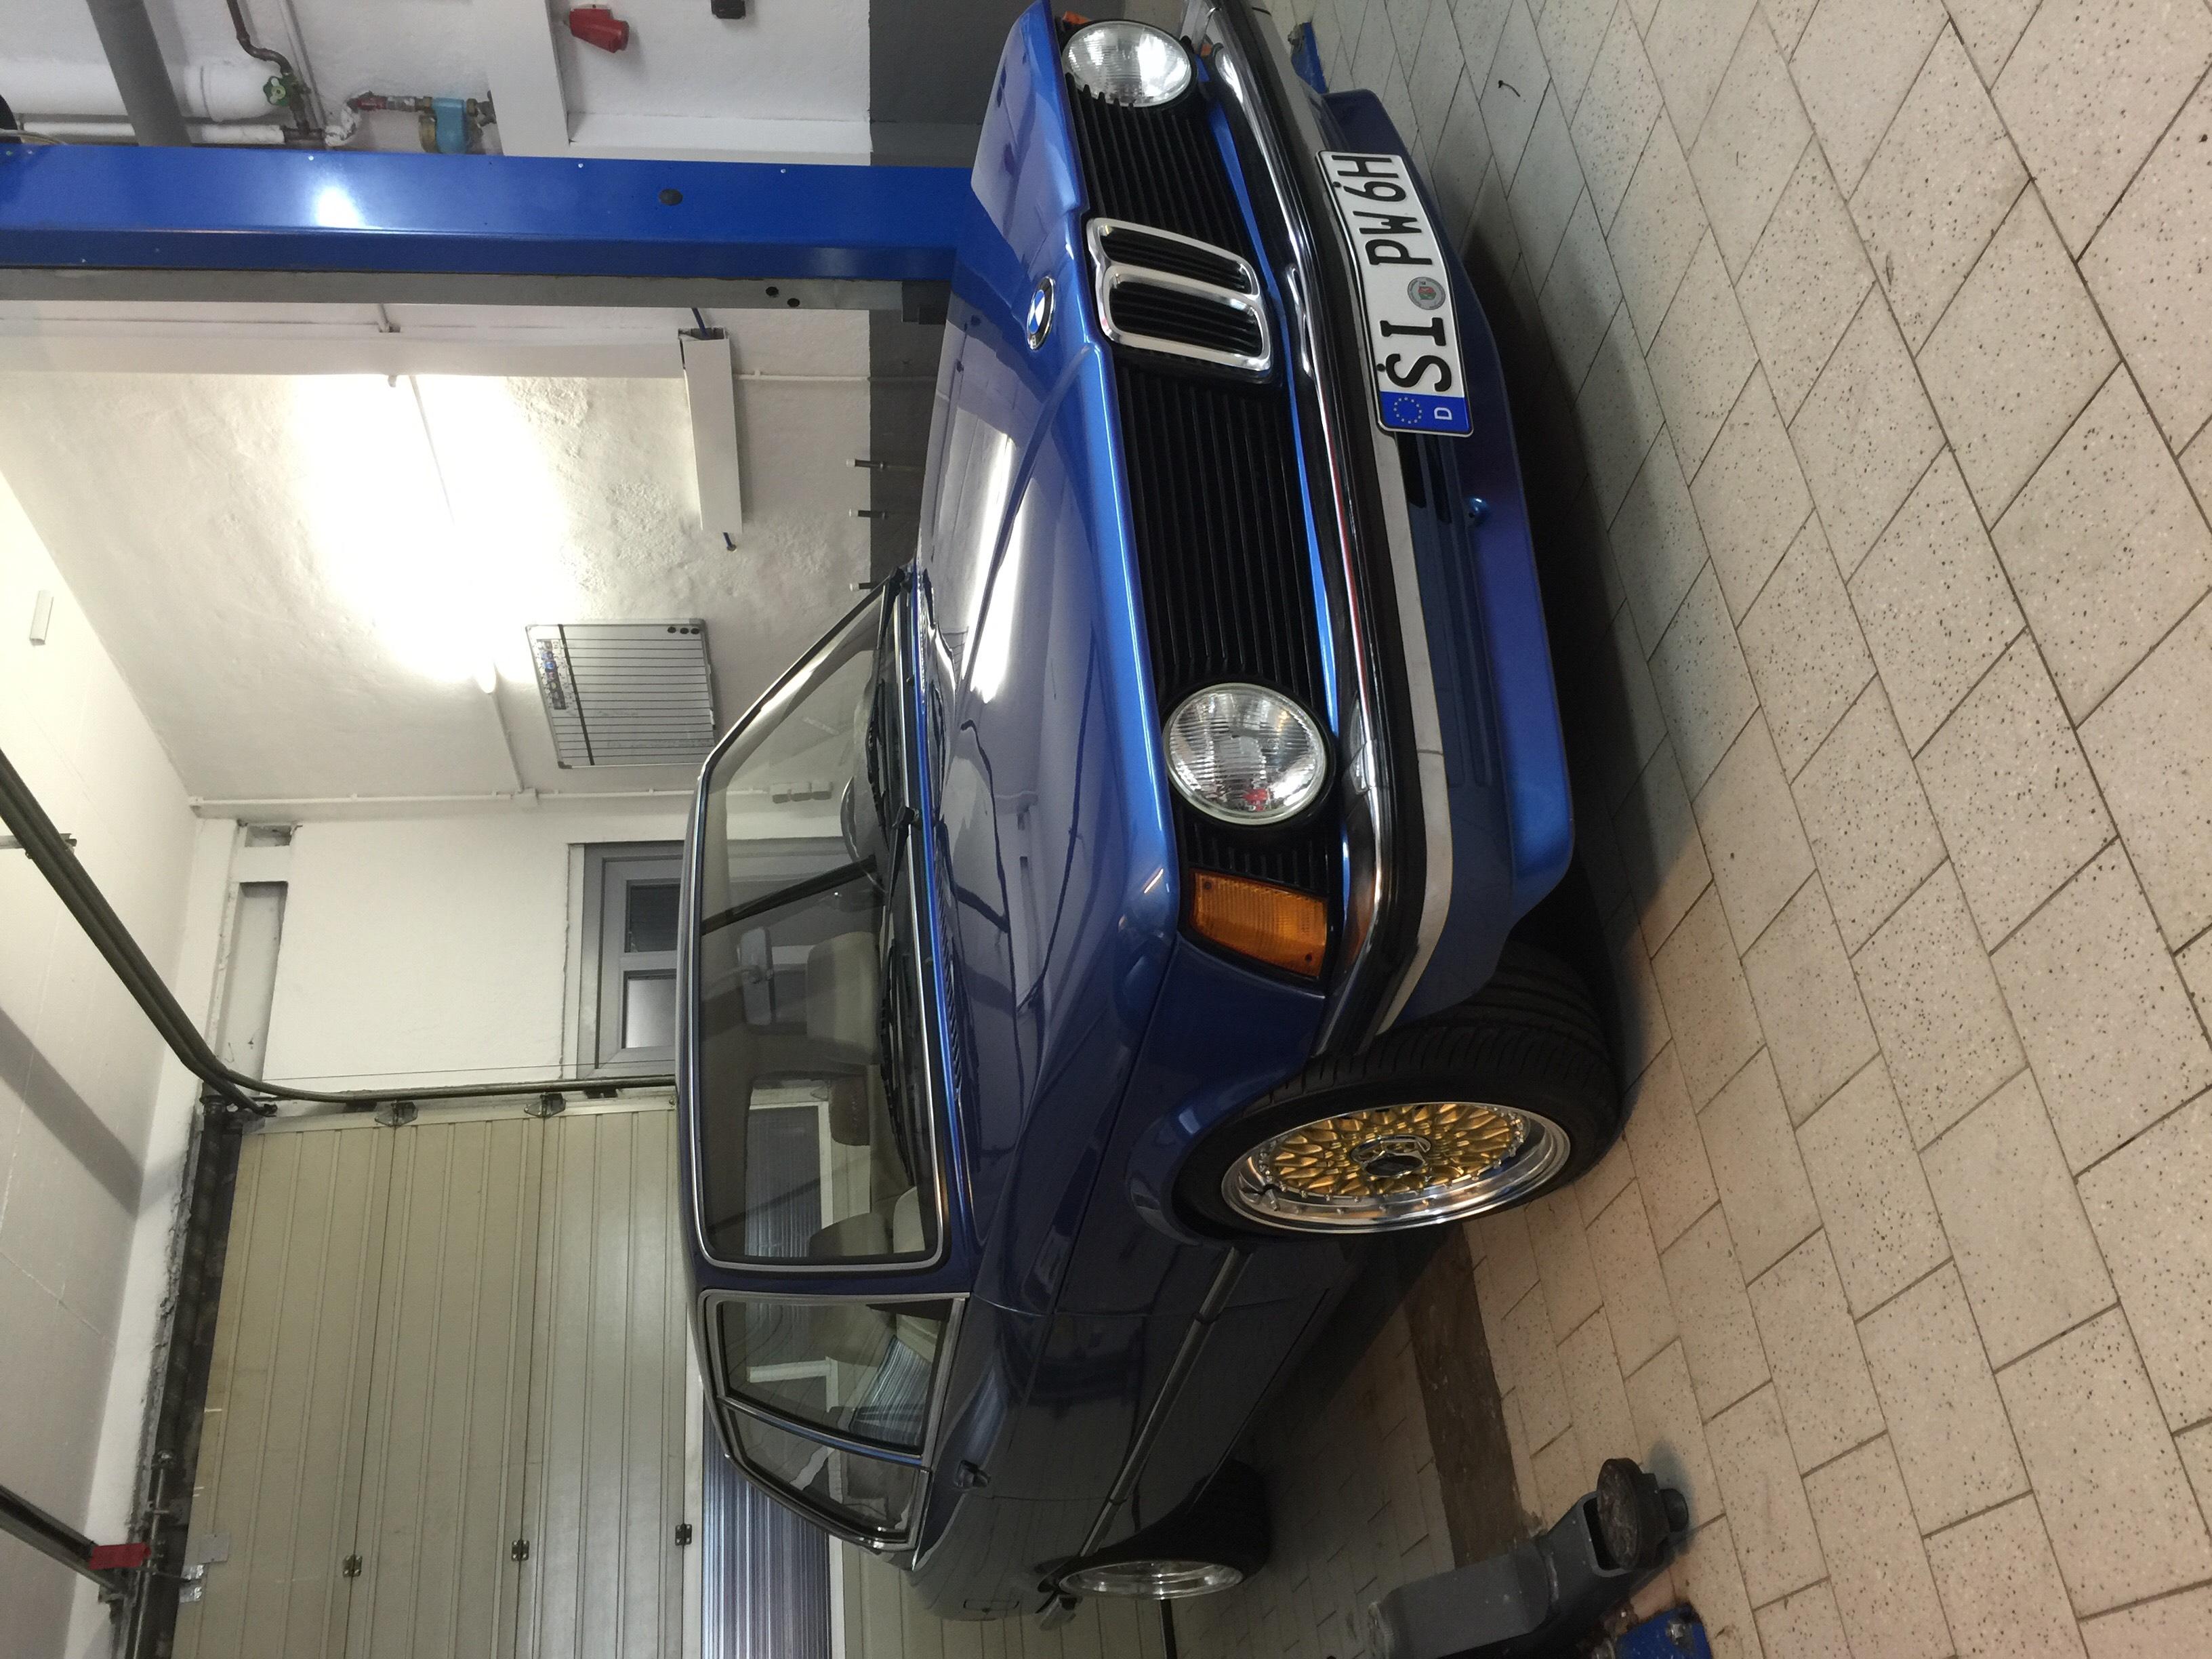 1975 bmw e21 320 4 for Garage bmw 77